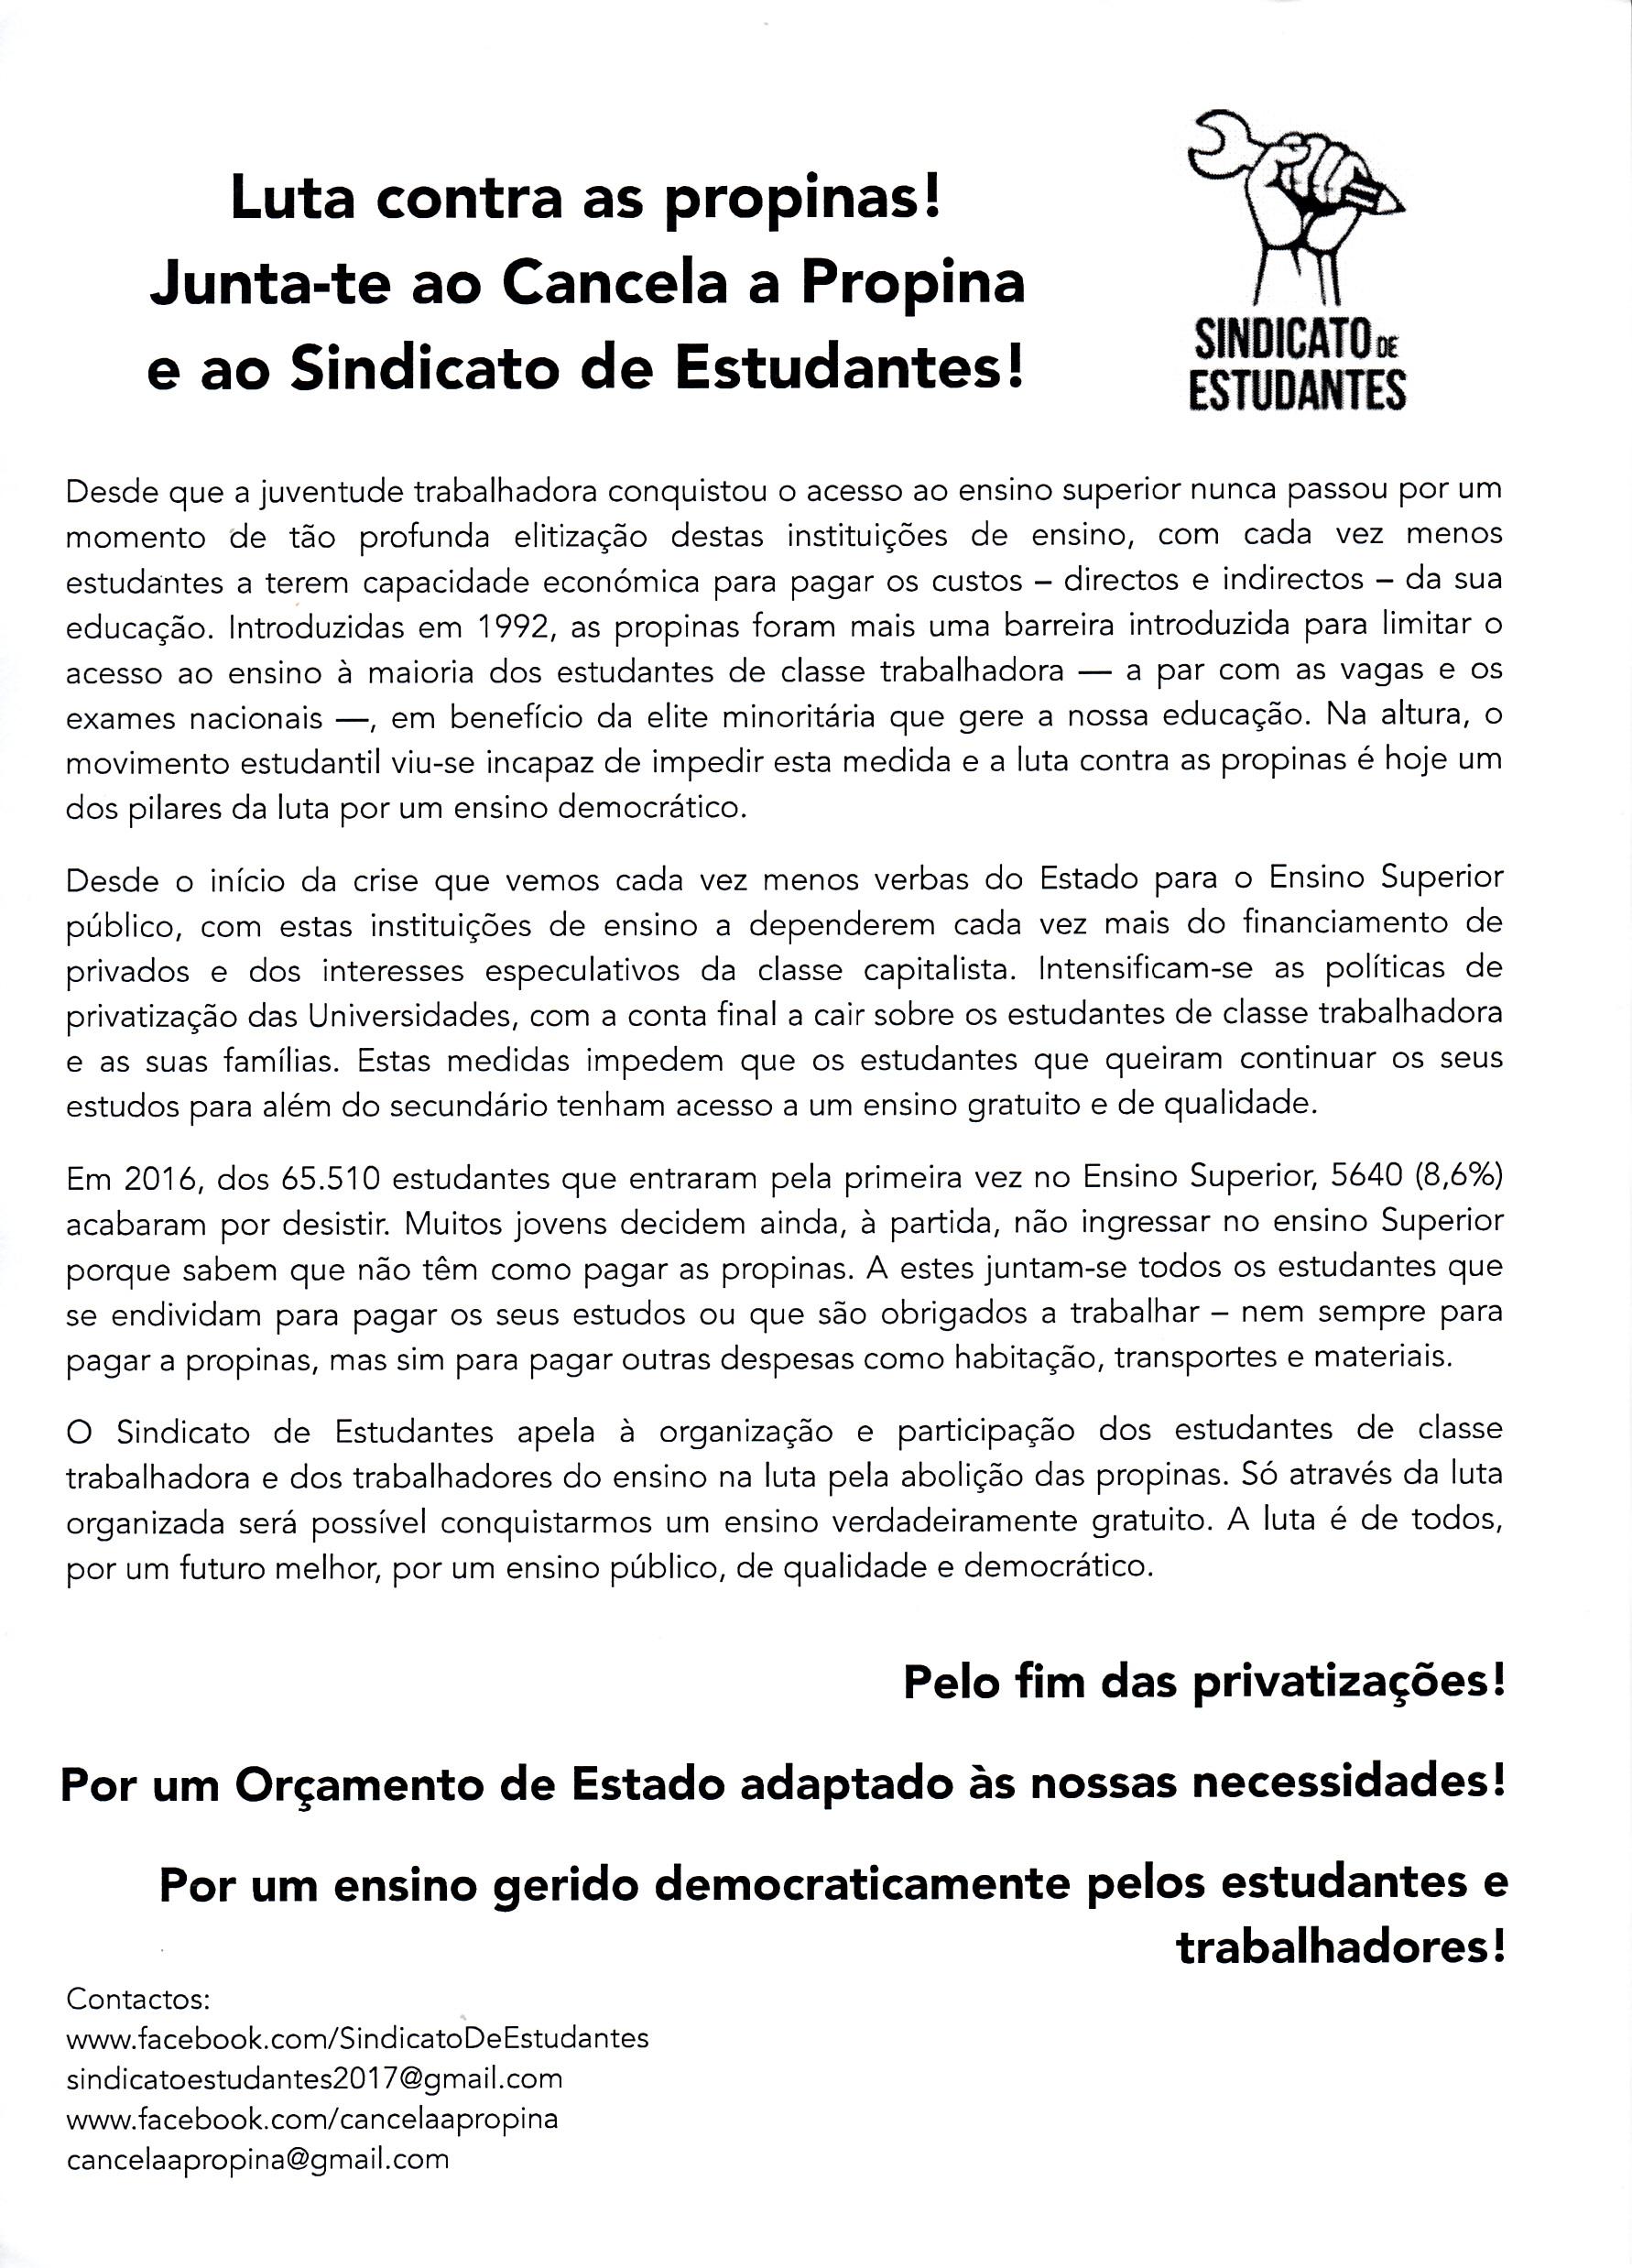 Sindicato_Estudantes_2018_04